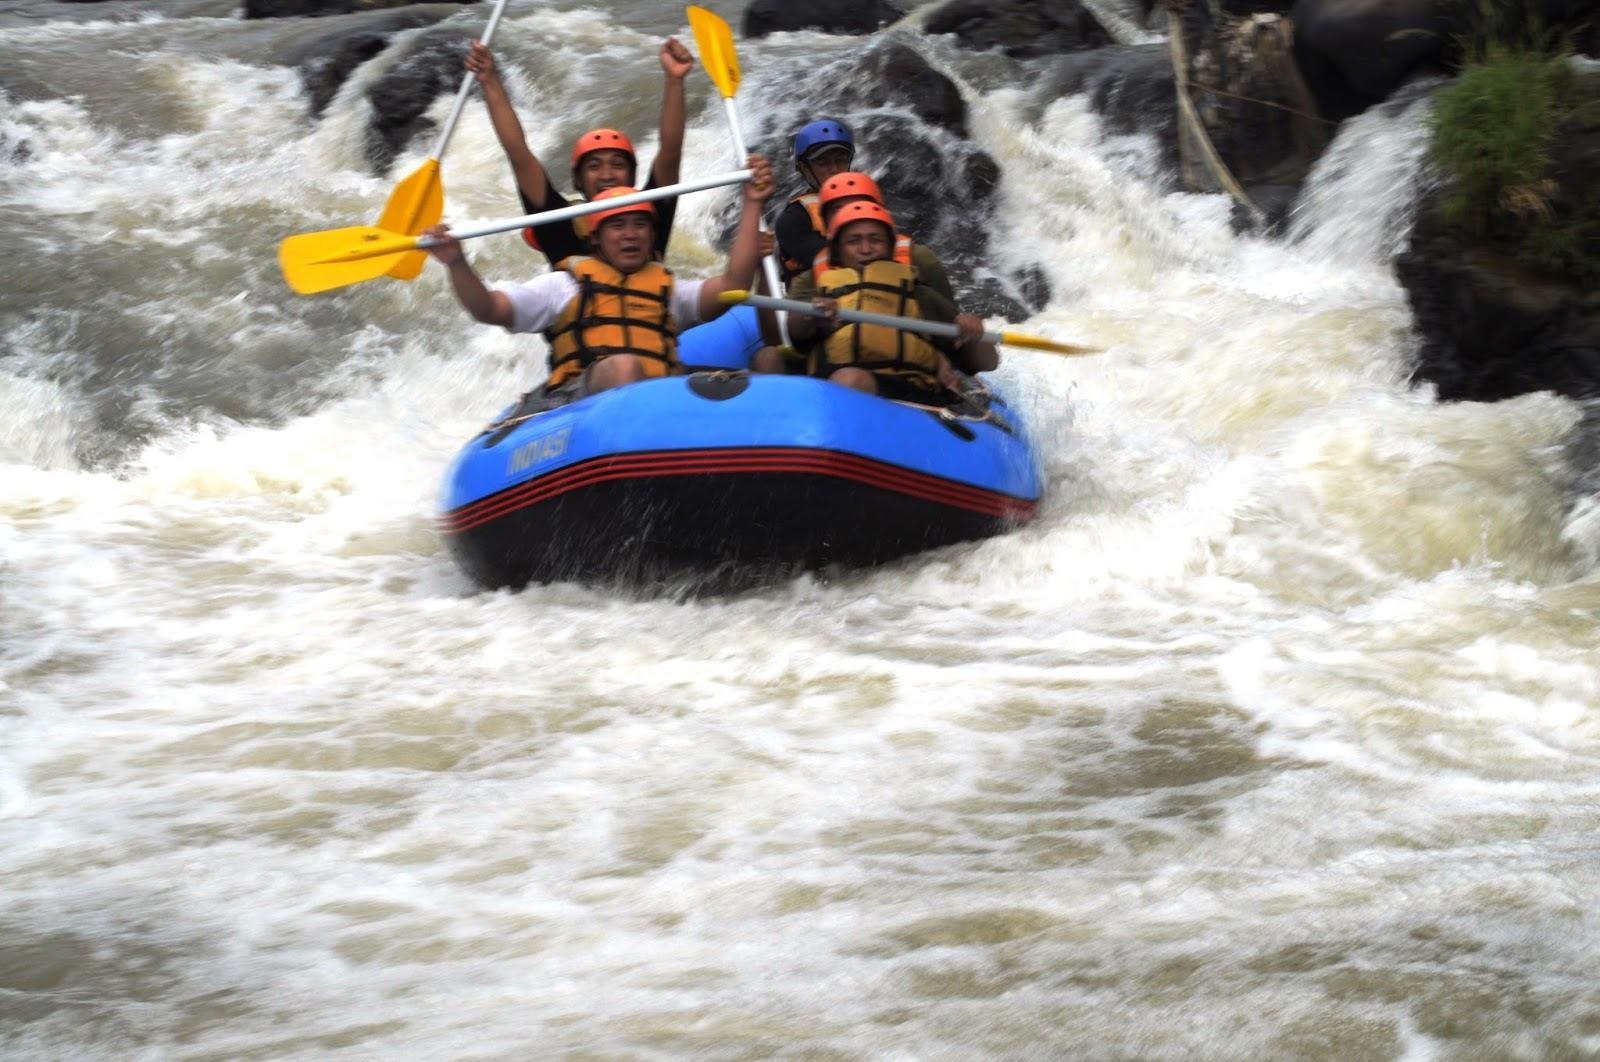 Paket Arung Jeram Cisadane Bogor Murah Maksud Wisata Rafting Sungai